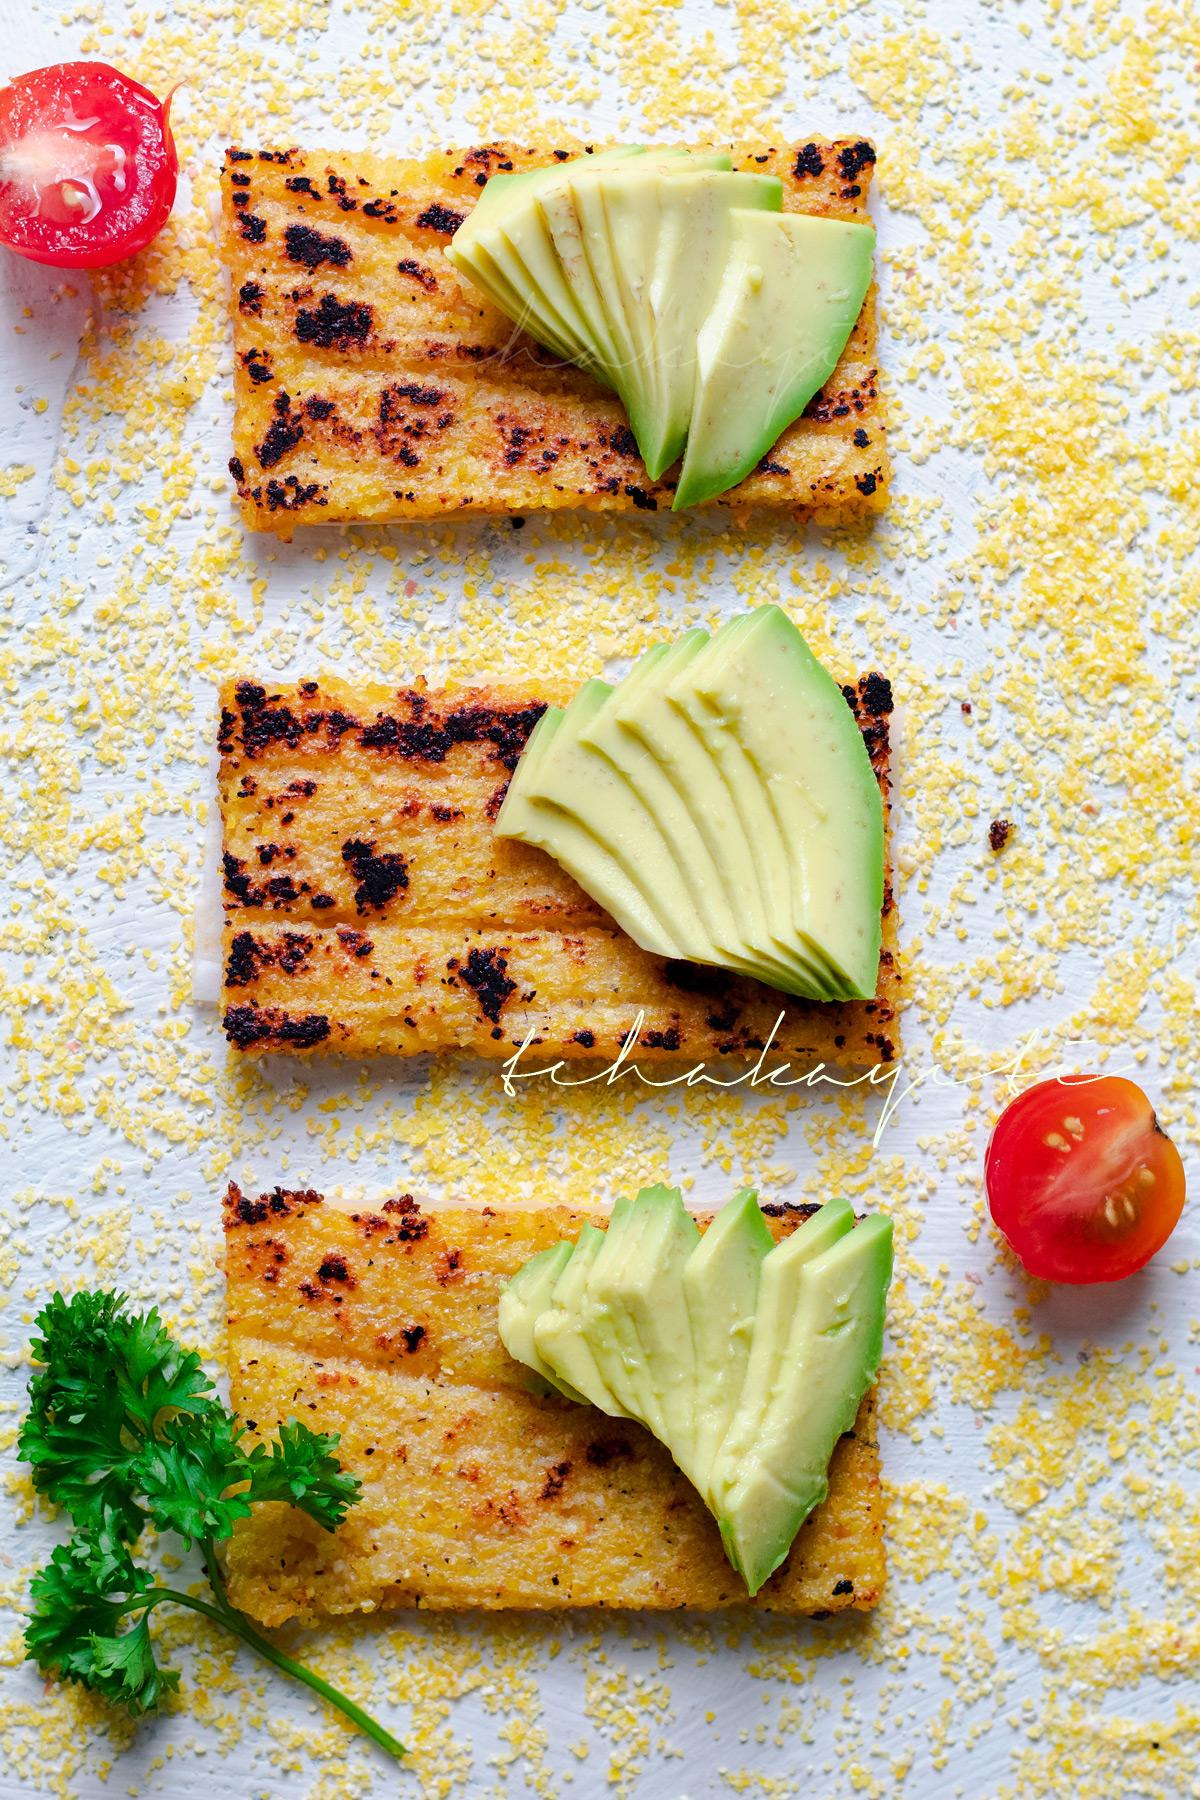 Grilled polenta taste juste as great as fried polenta. | tchakayiti.com